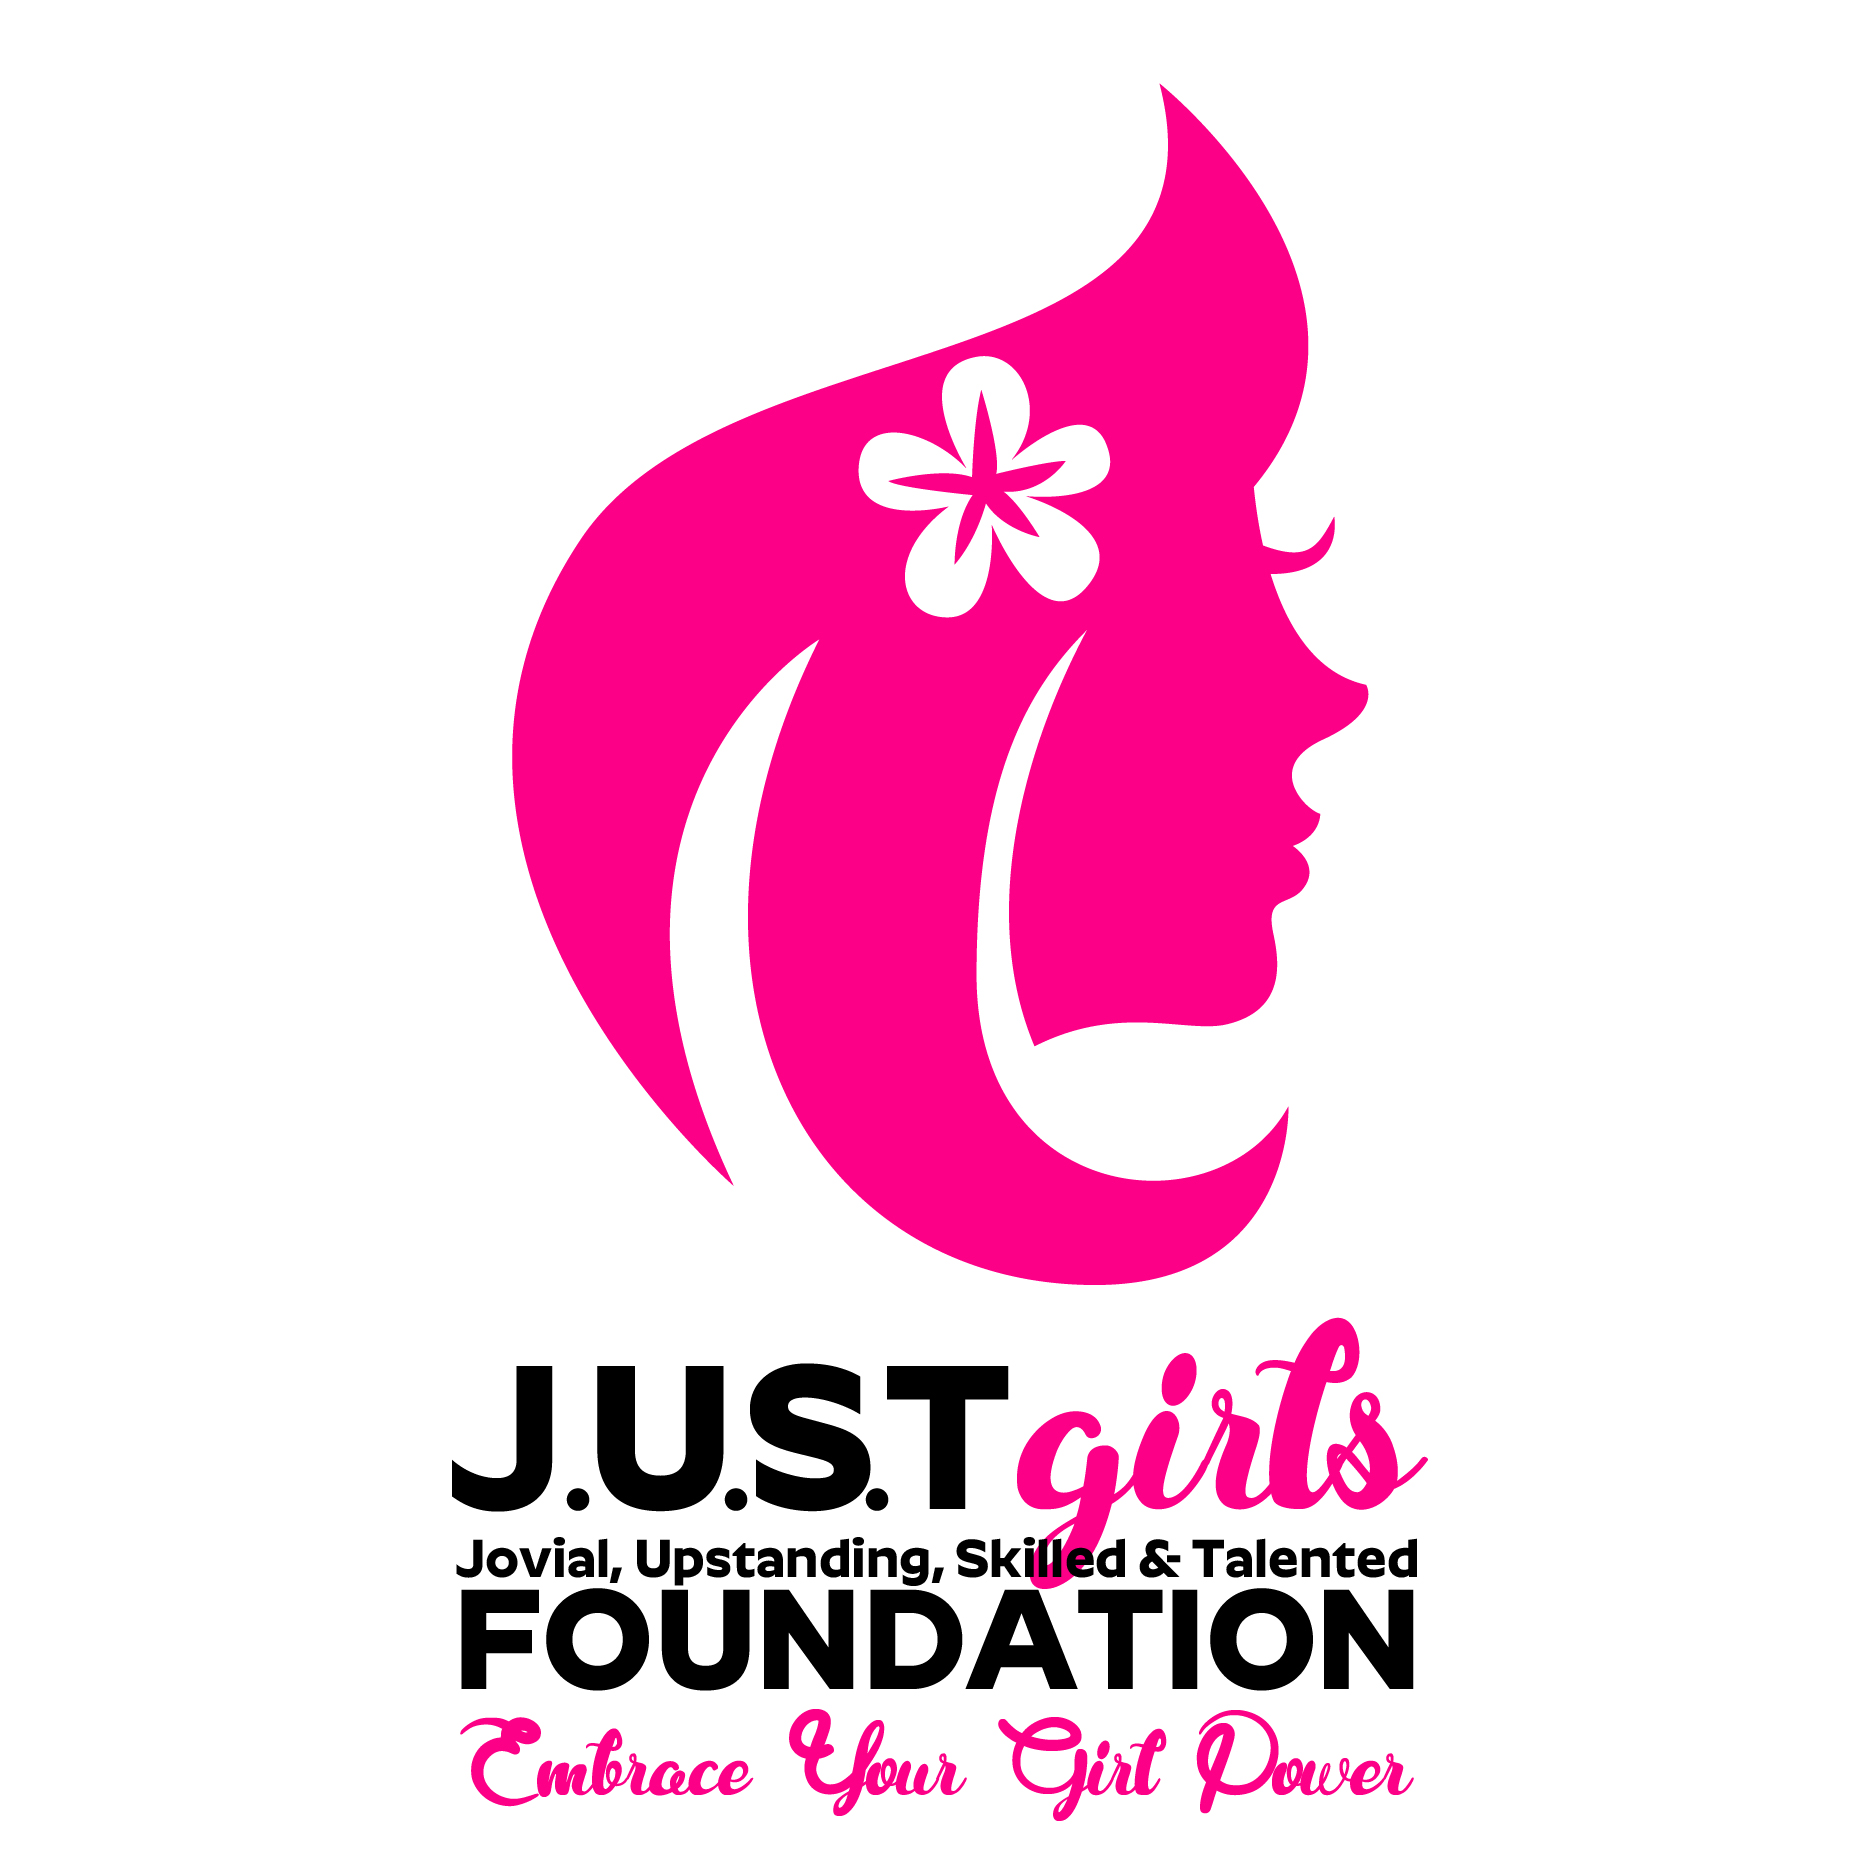 JUST girls Foundation-01.jpg